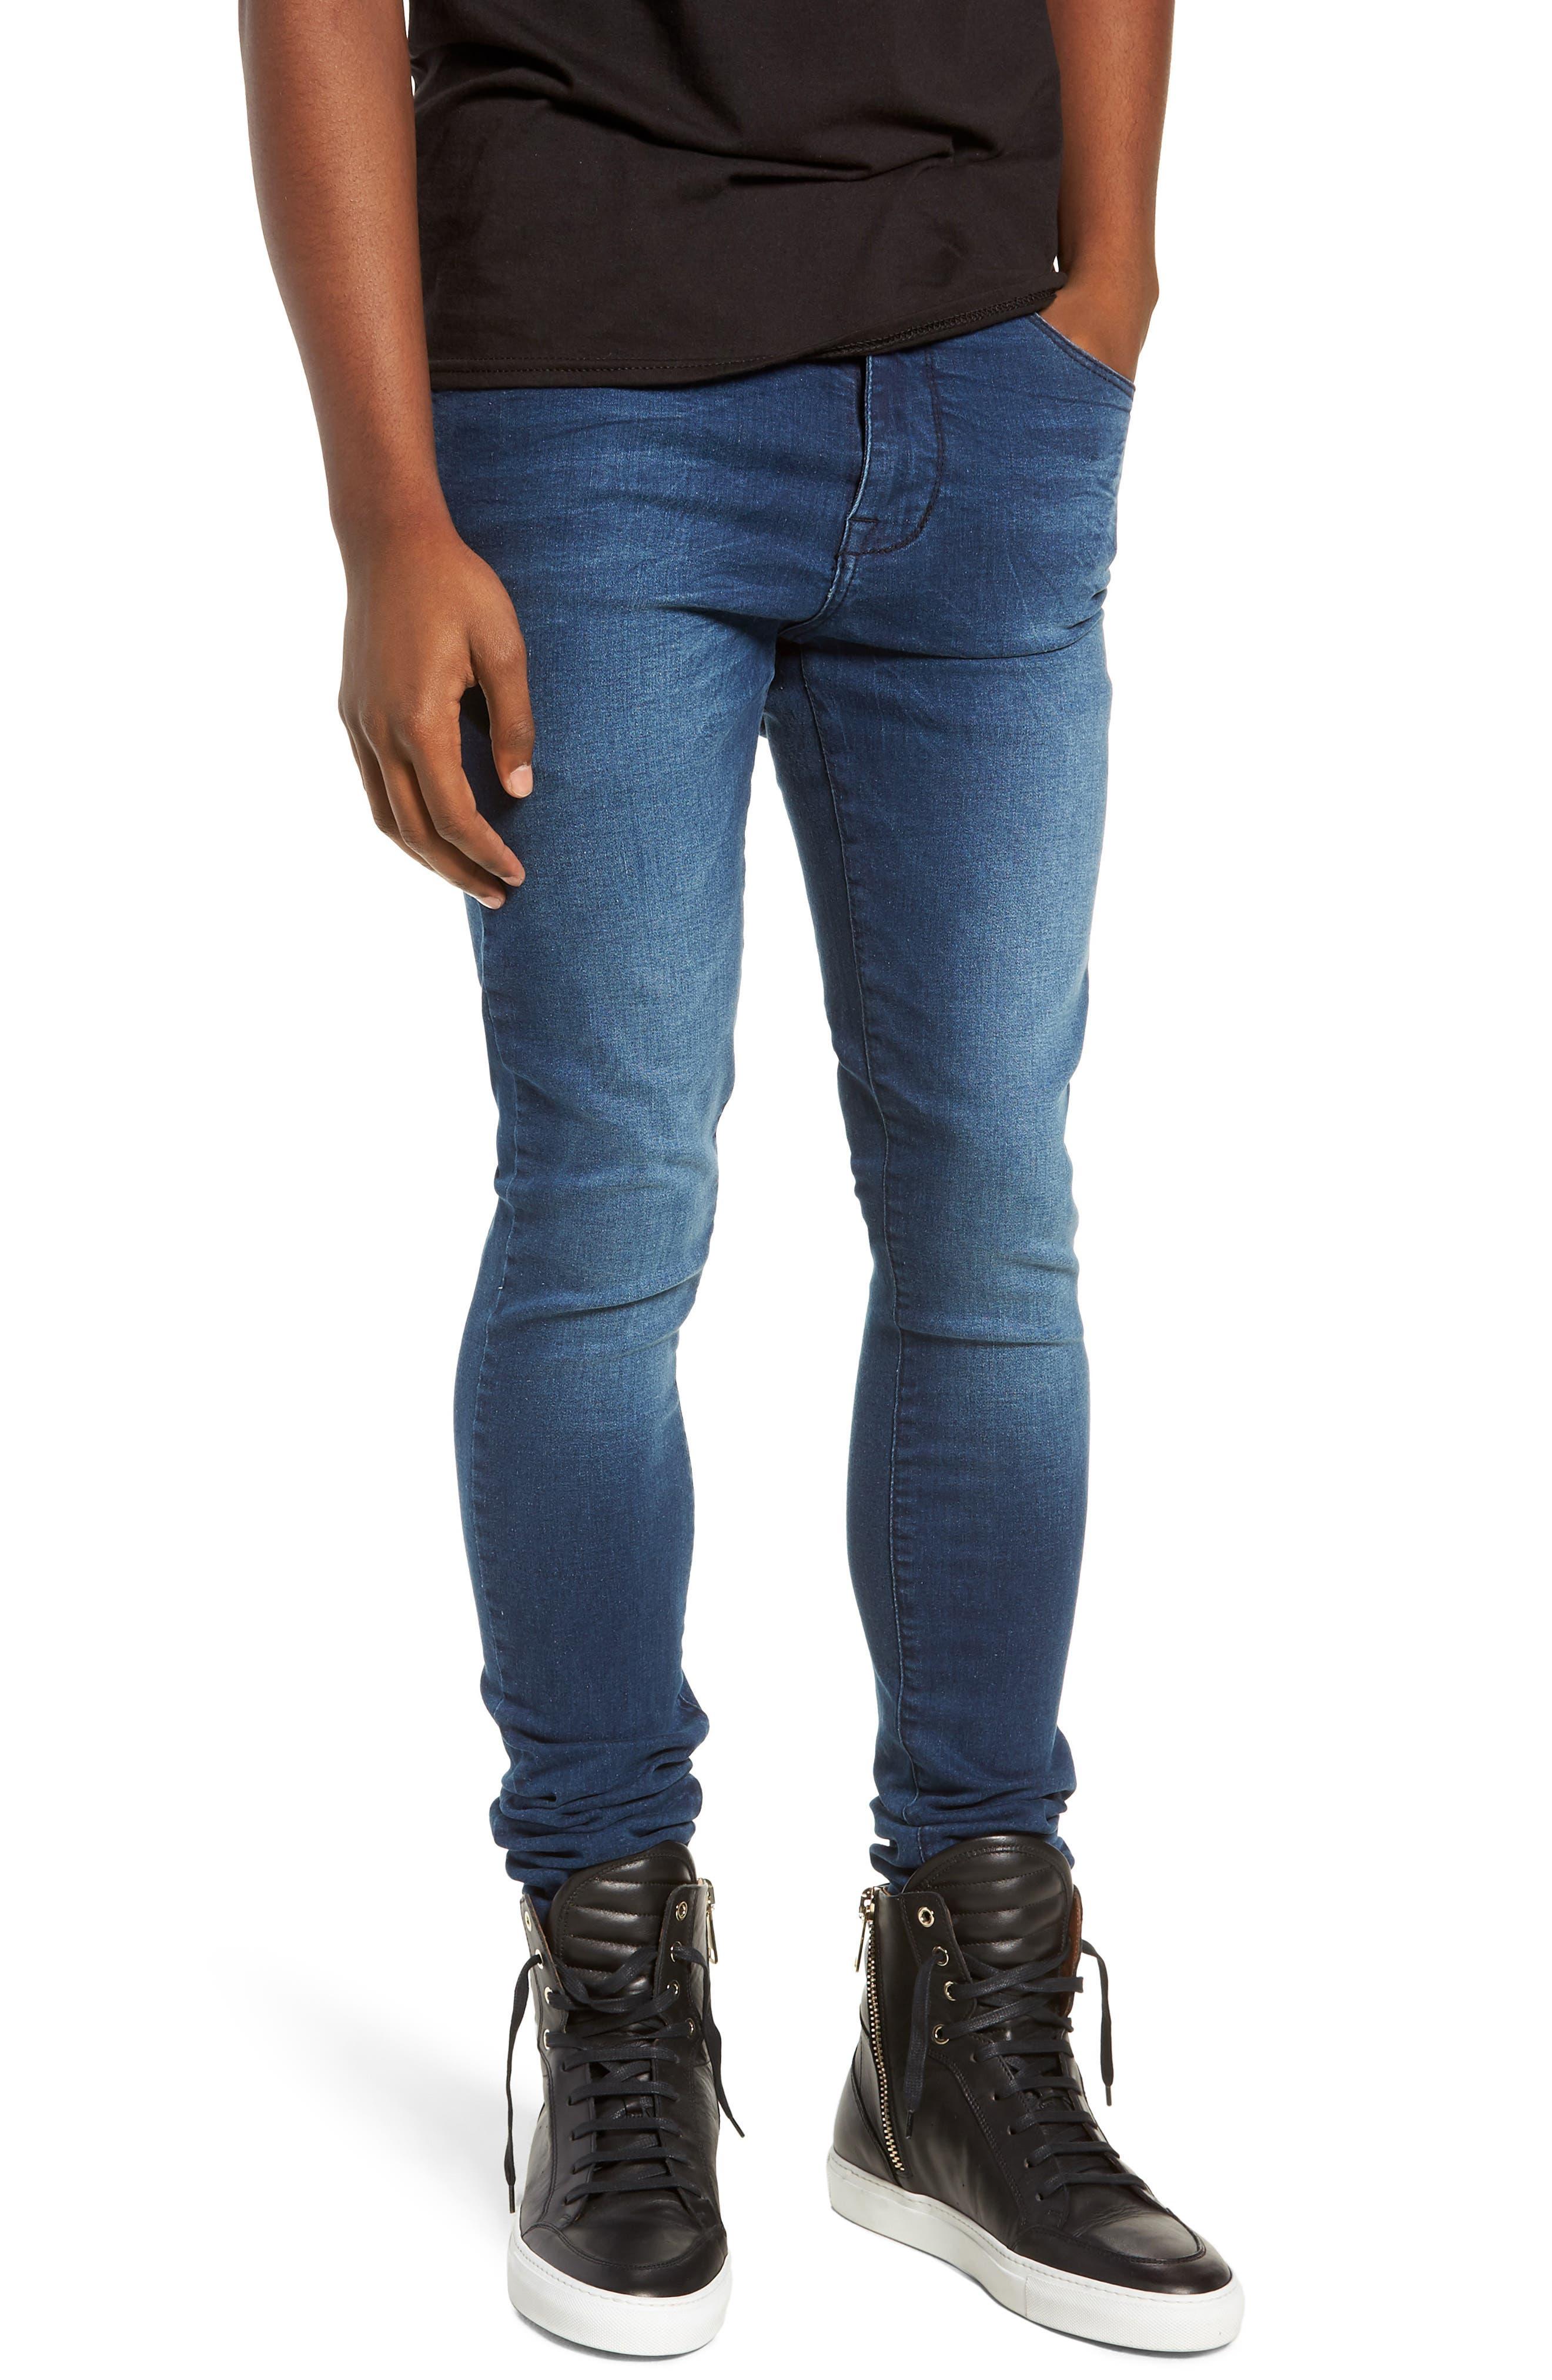 Leroy Skinny Fit Jeans,                         Main,                         color, WORN DARK BLUE